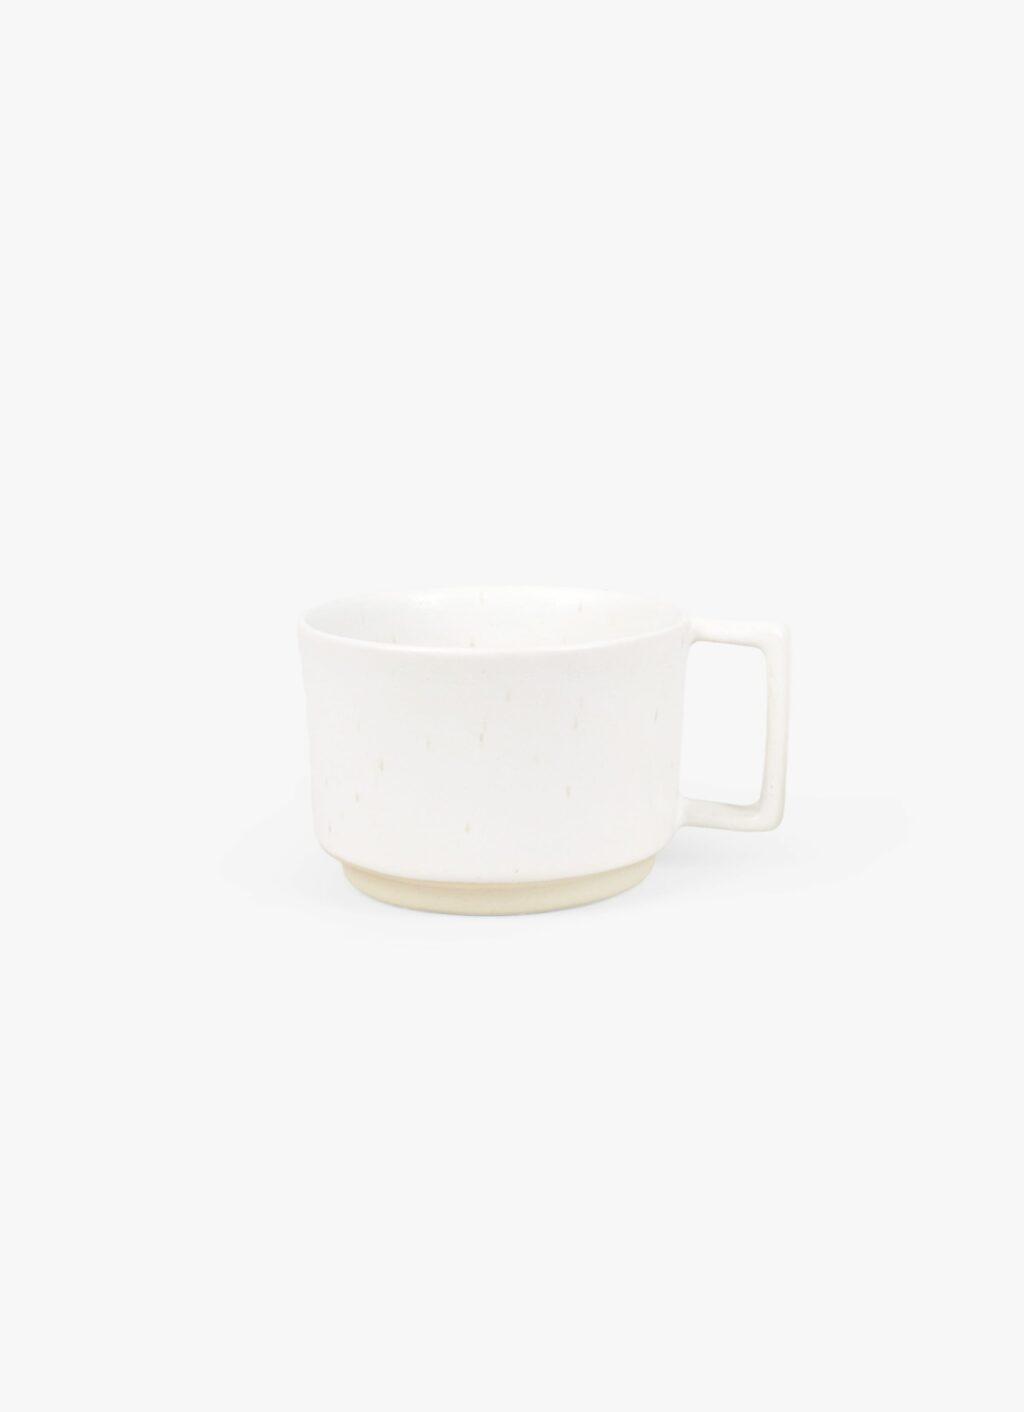 Frama - Otto - Low Mug with Handle - White